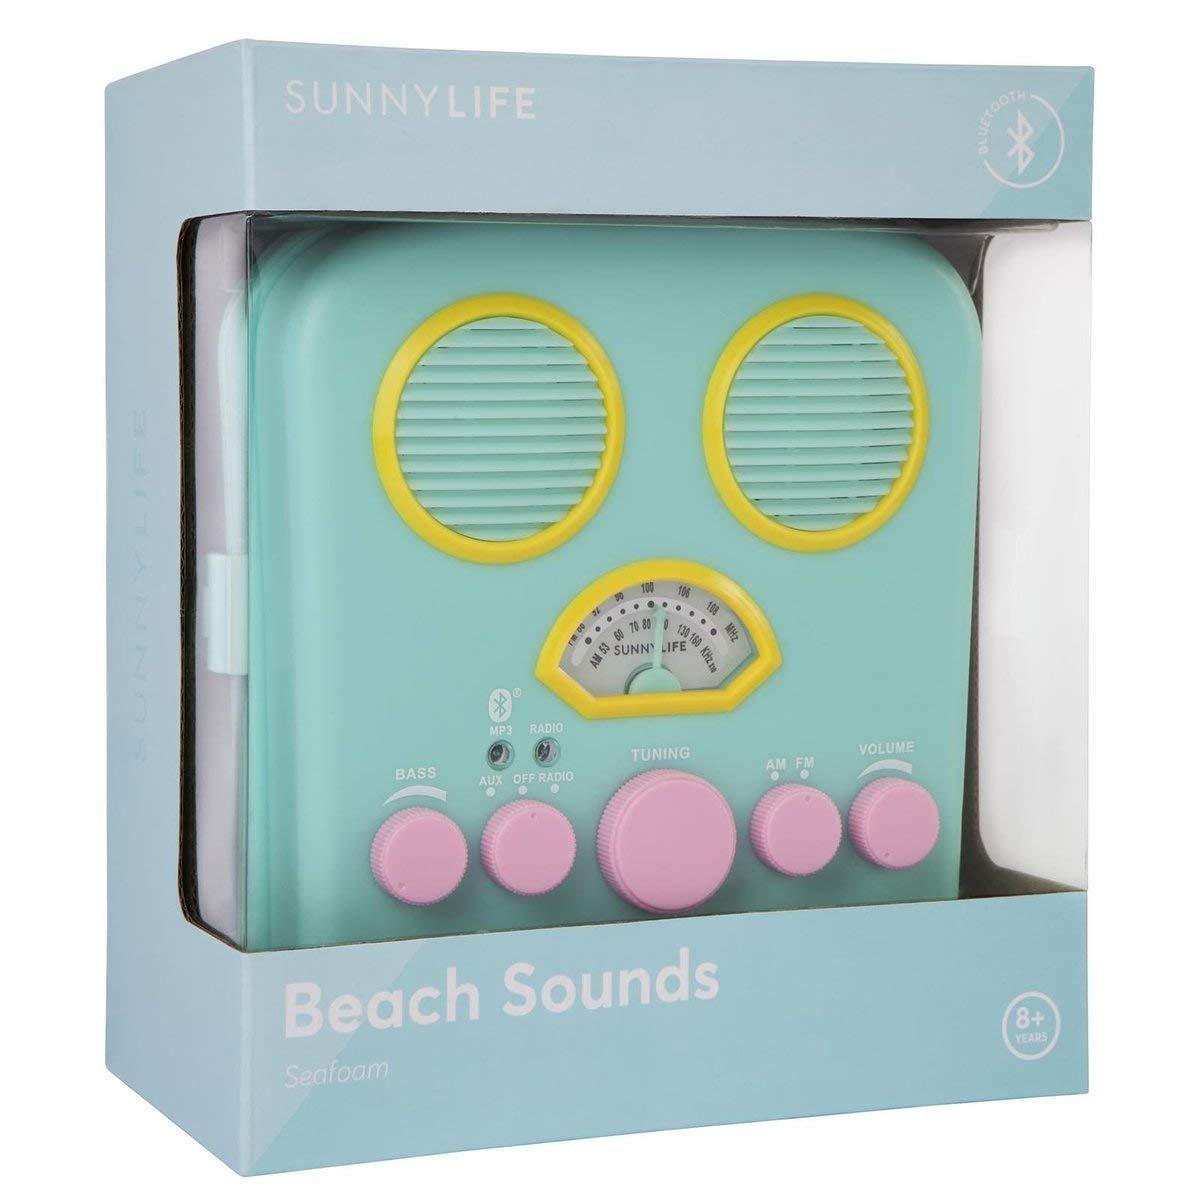 SunnyLIFE Portable Beach MP3 Speaker with AM//FM Radio and Smartphone Holder